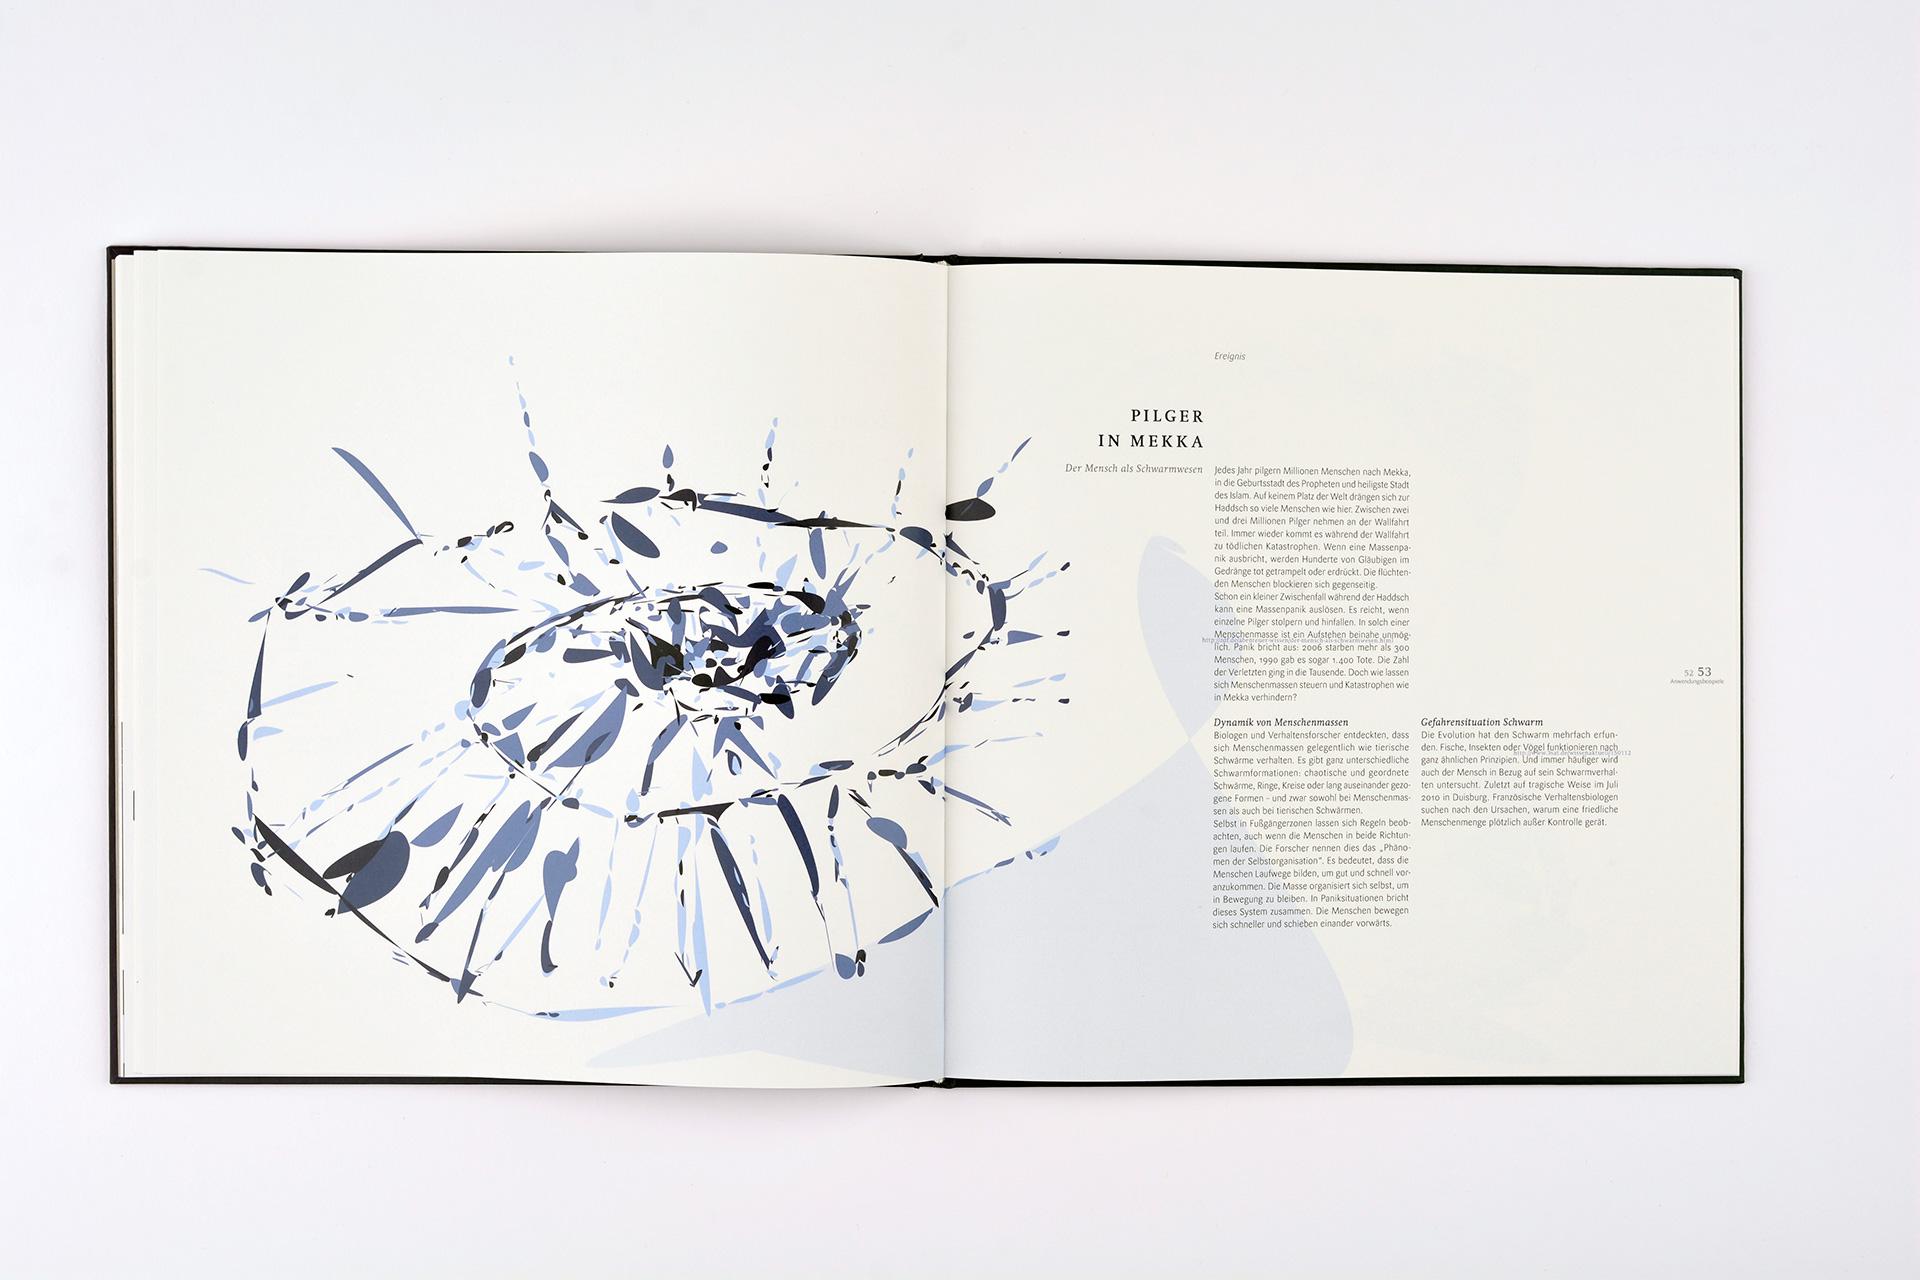 Schwarmintelligenz, Design, Kollektiv, Buch, Bachelor, Studie, Grafik, Illustration, Bennet Grüttner